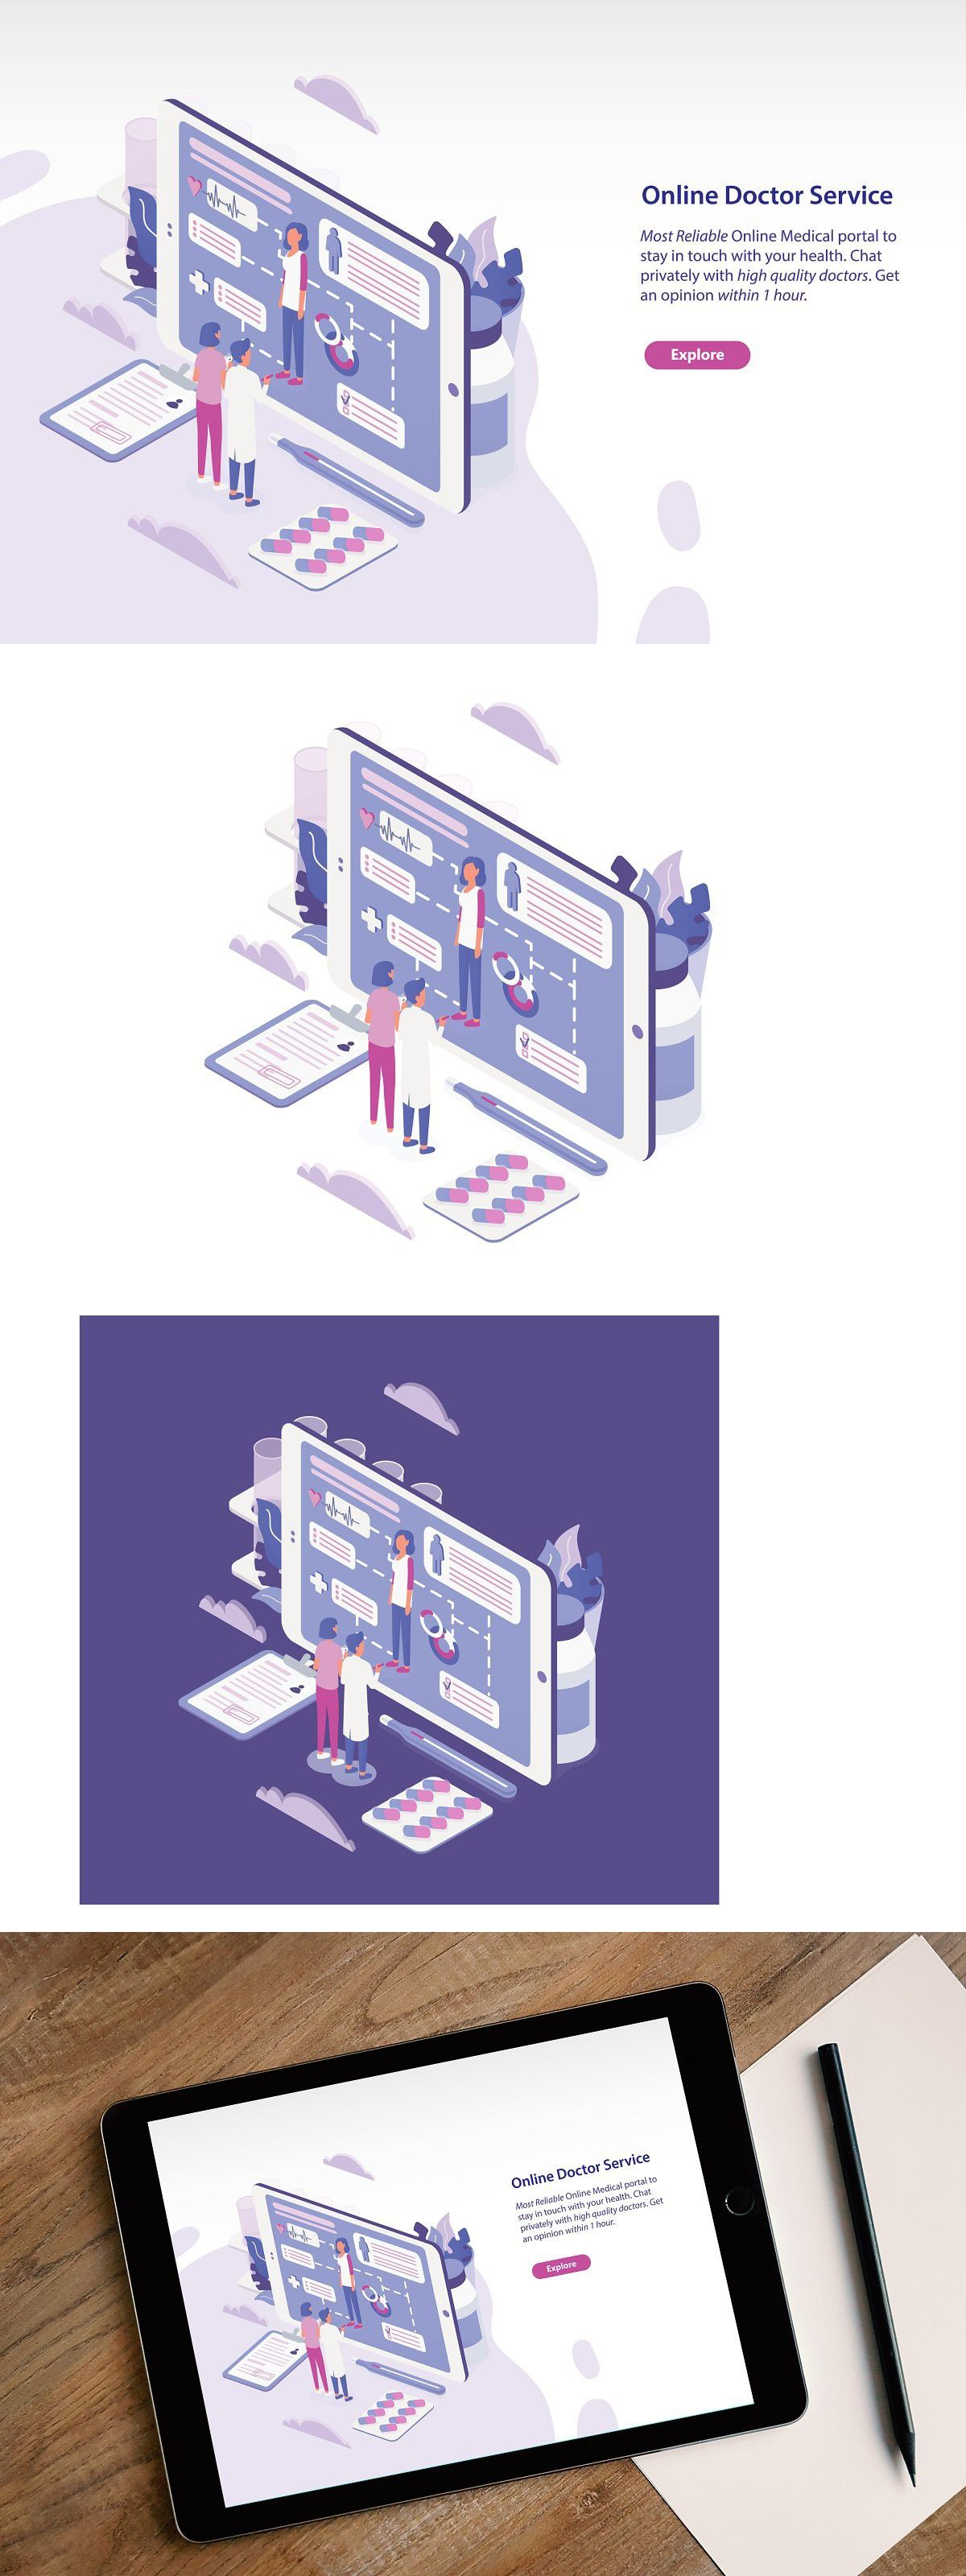 Online Doctor Concept Isometric Design Online Doctor Isometric Illustration